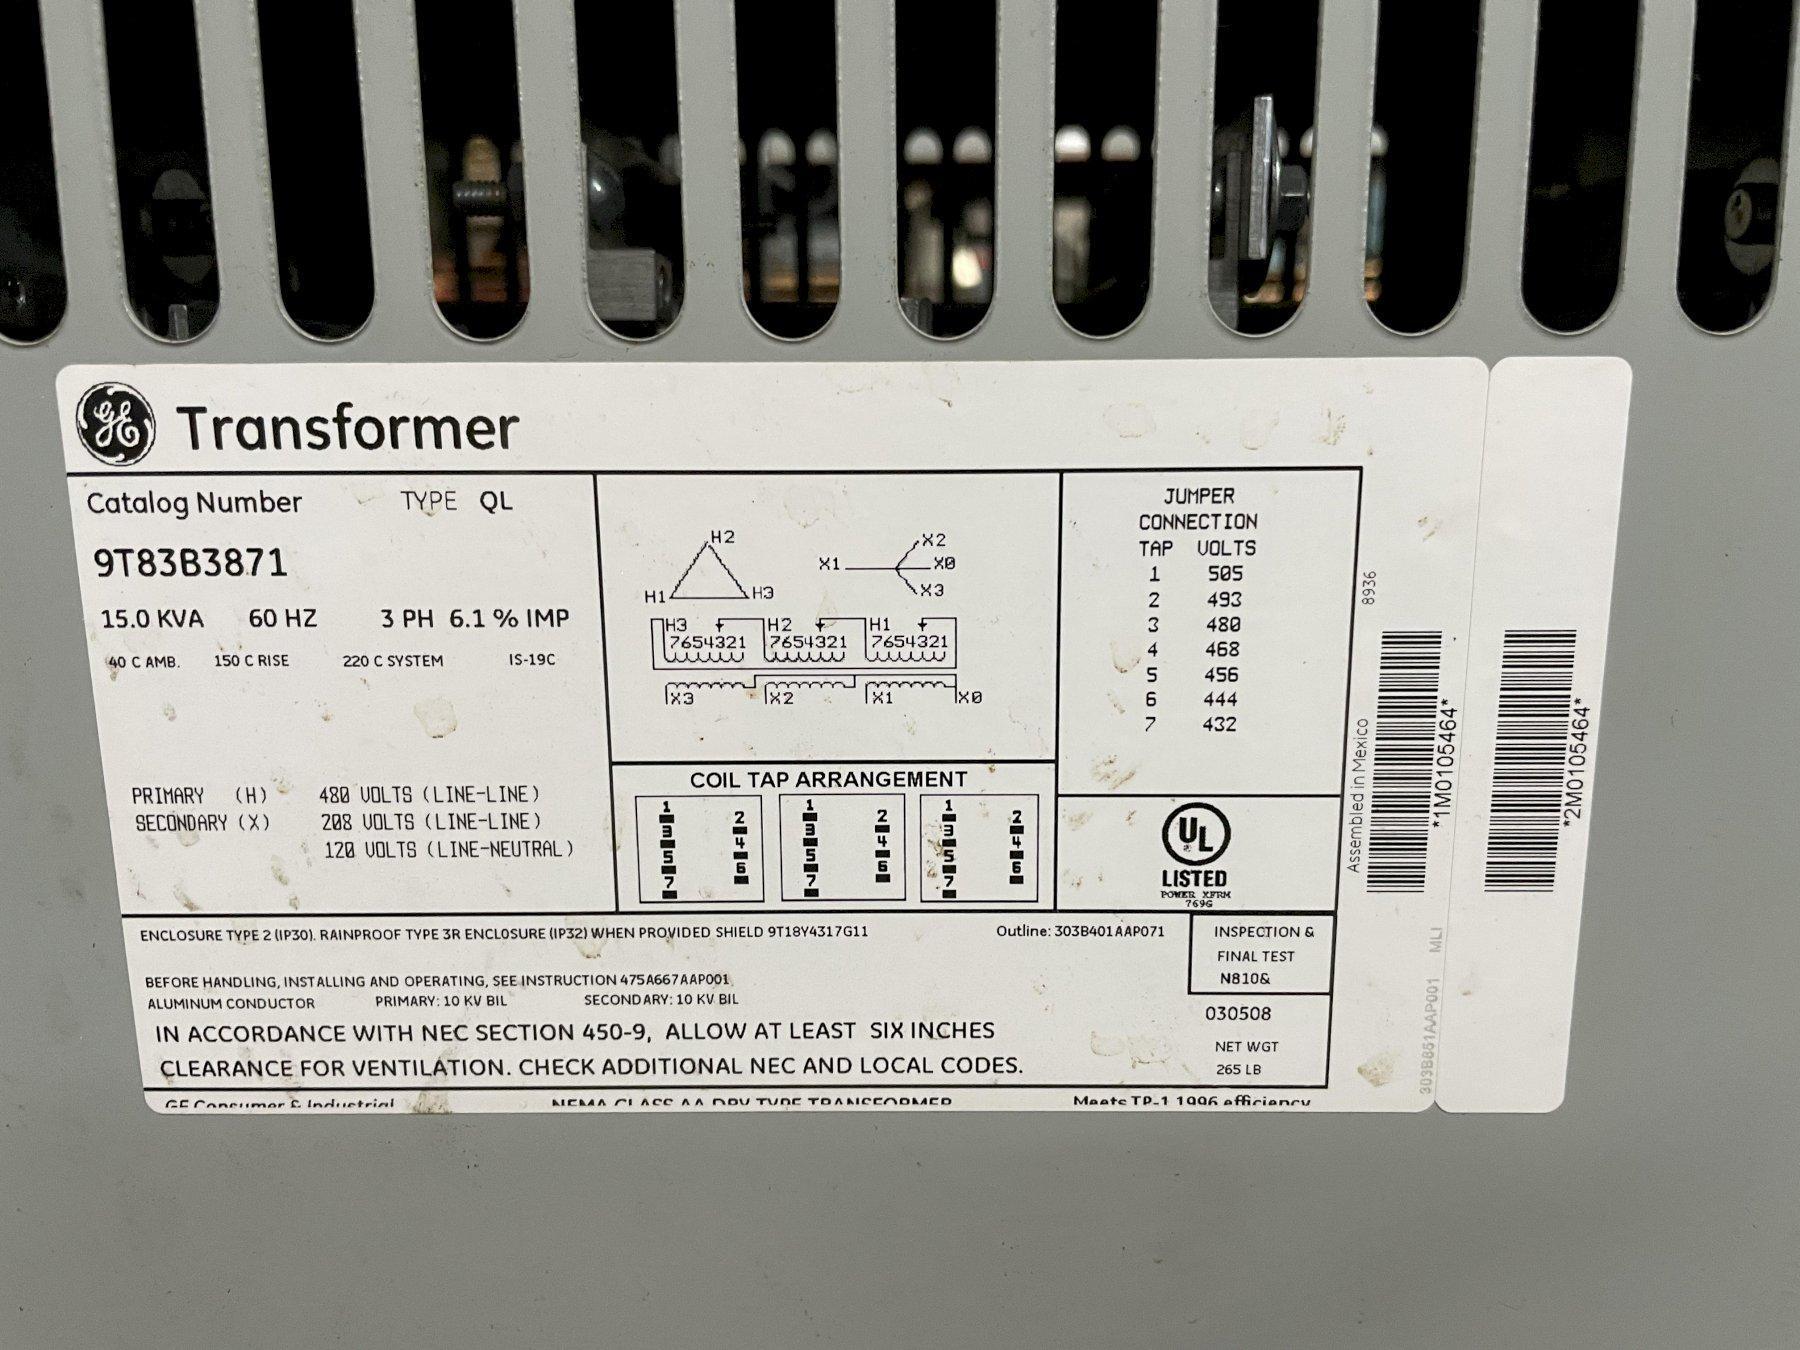 15 KVA GENERAL ELECTRIC 3-PHASE GENERAL PURPOSE TRANSFORMER 9T83B3871, Series QL, 480Y-208Y/120, 60 Hz, Multi Tap, Dry Type.